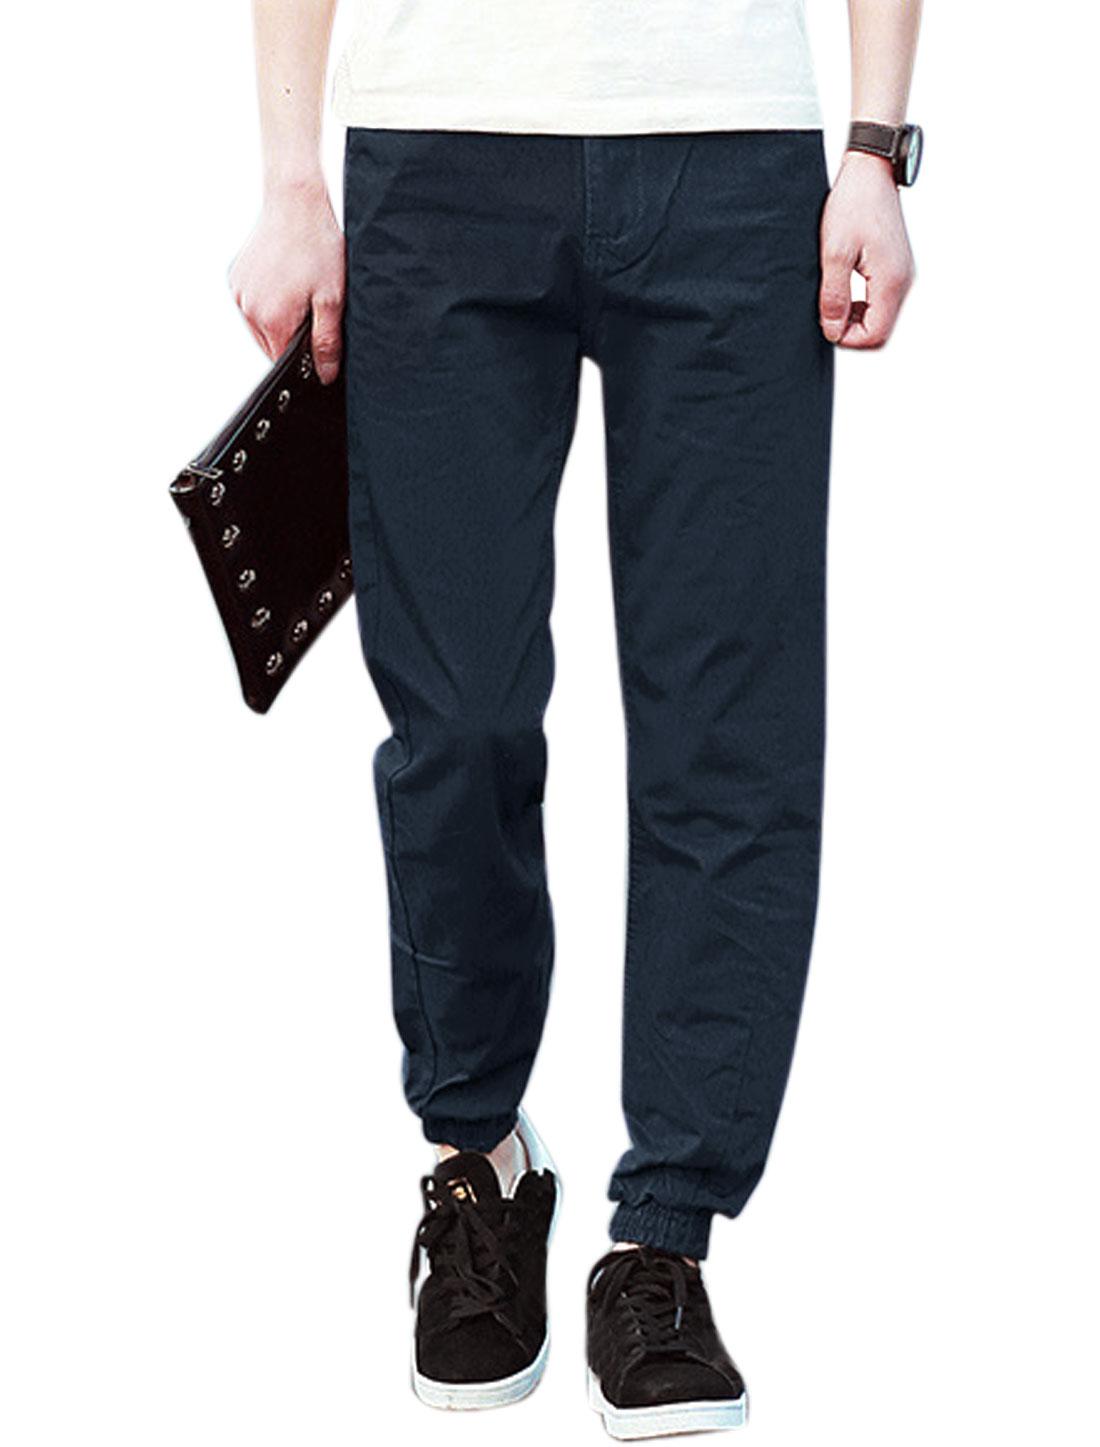 Men Elastic Cuffs Two Pockets Front Belt Loop Casual Pants Navy Blues W32